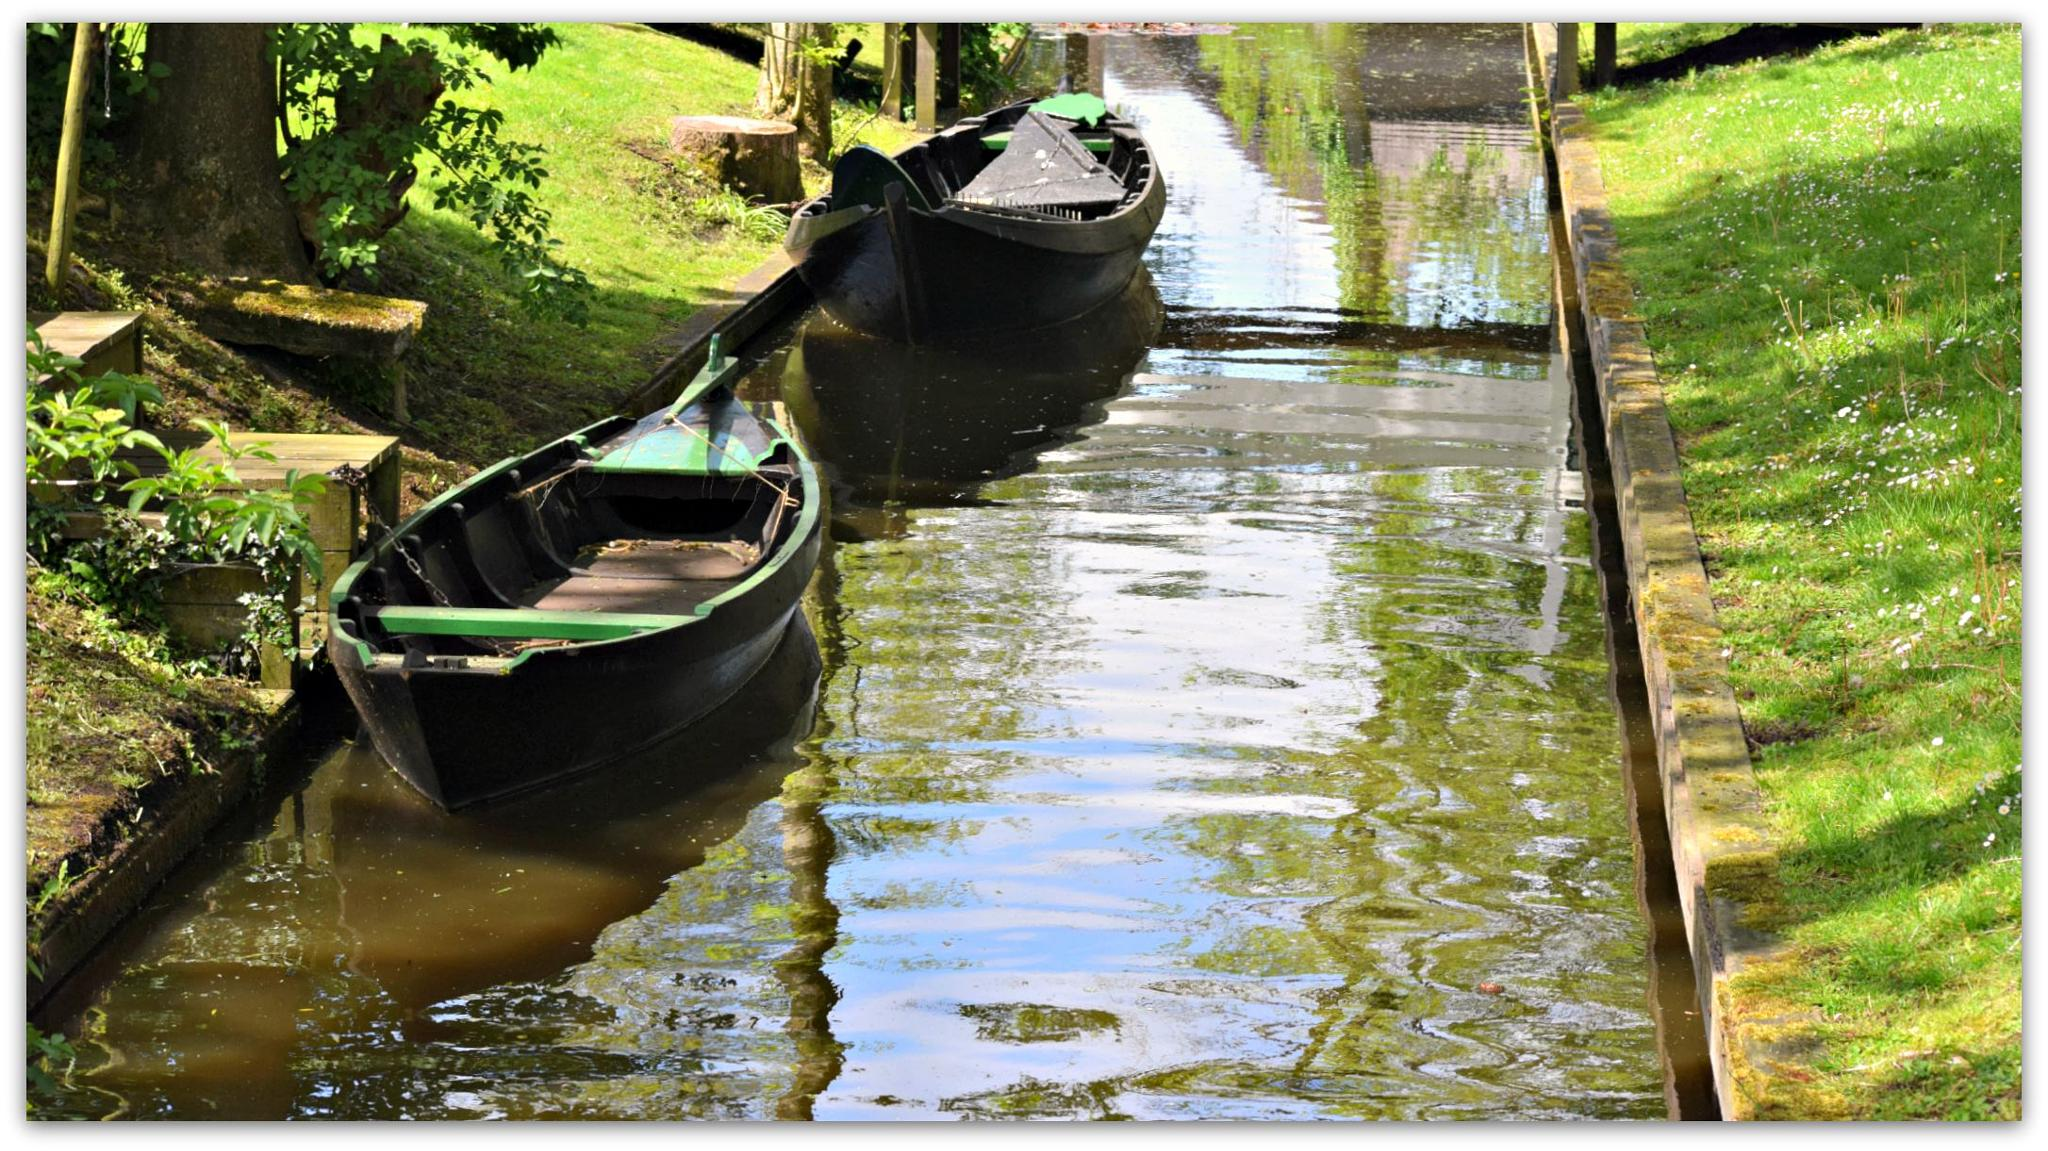 Somewhere in Holland by maria.telegdy